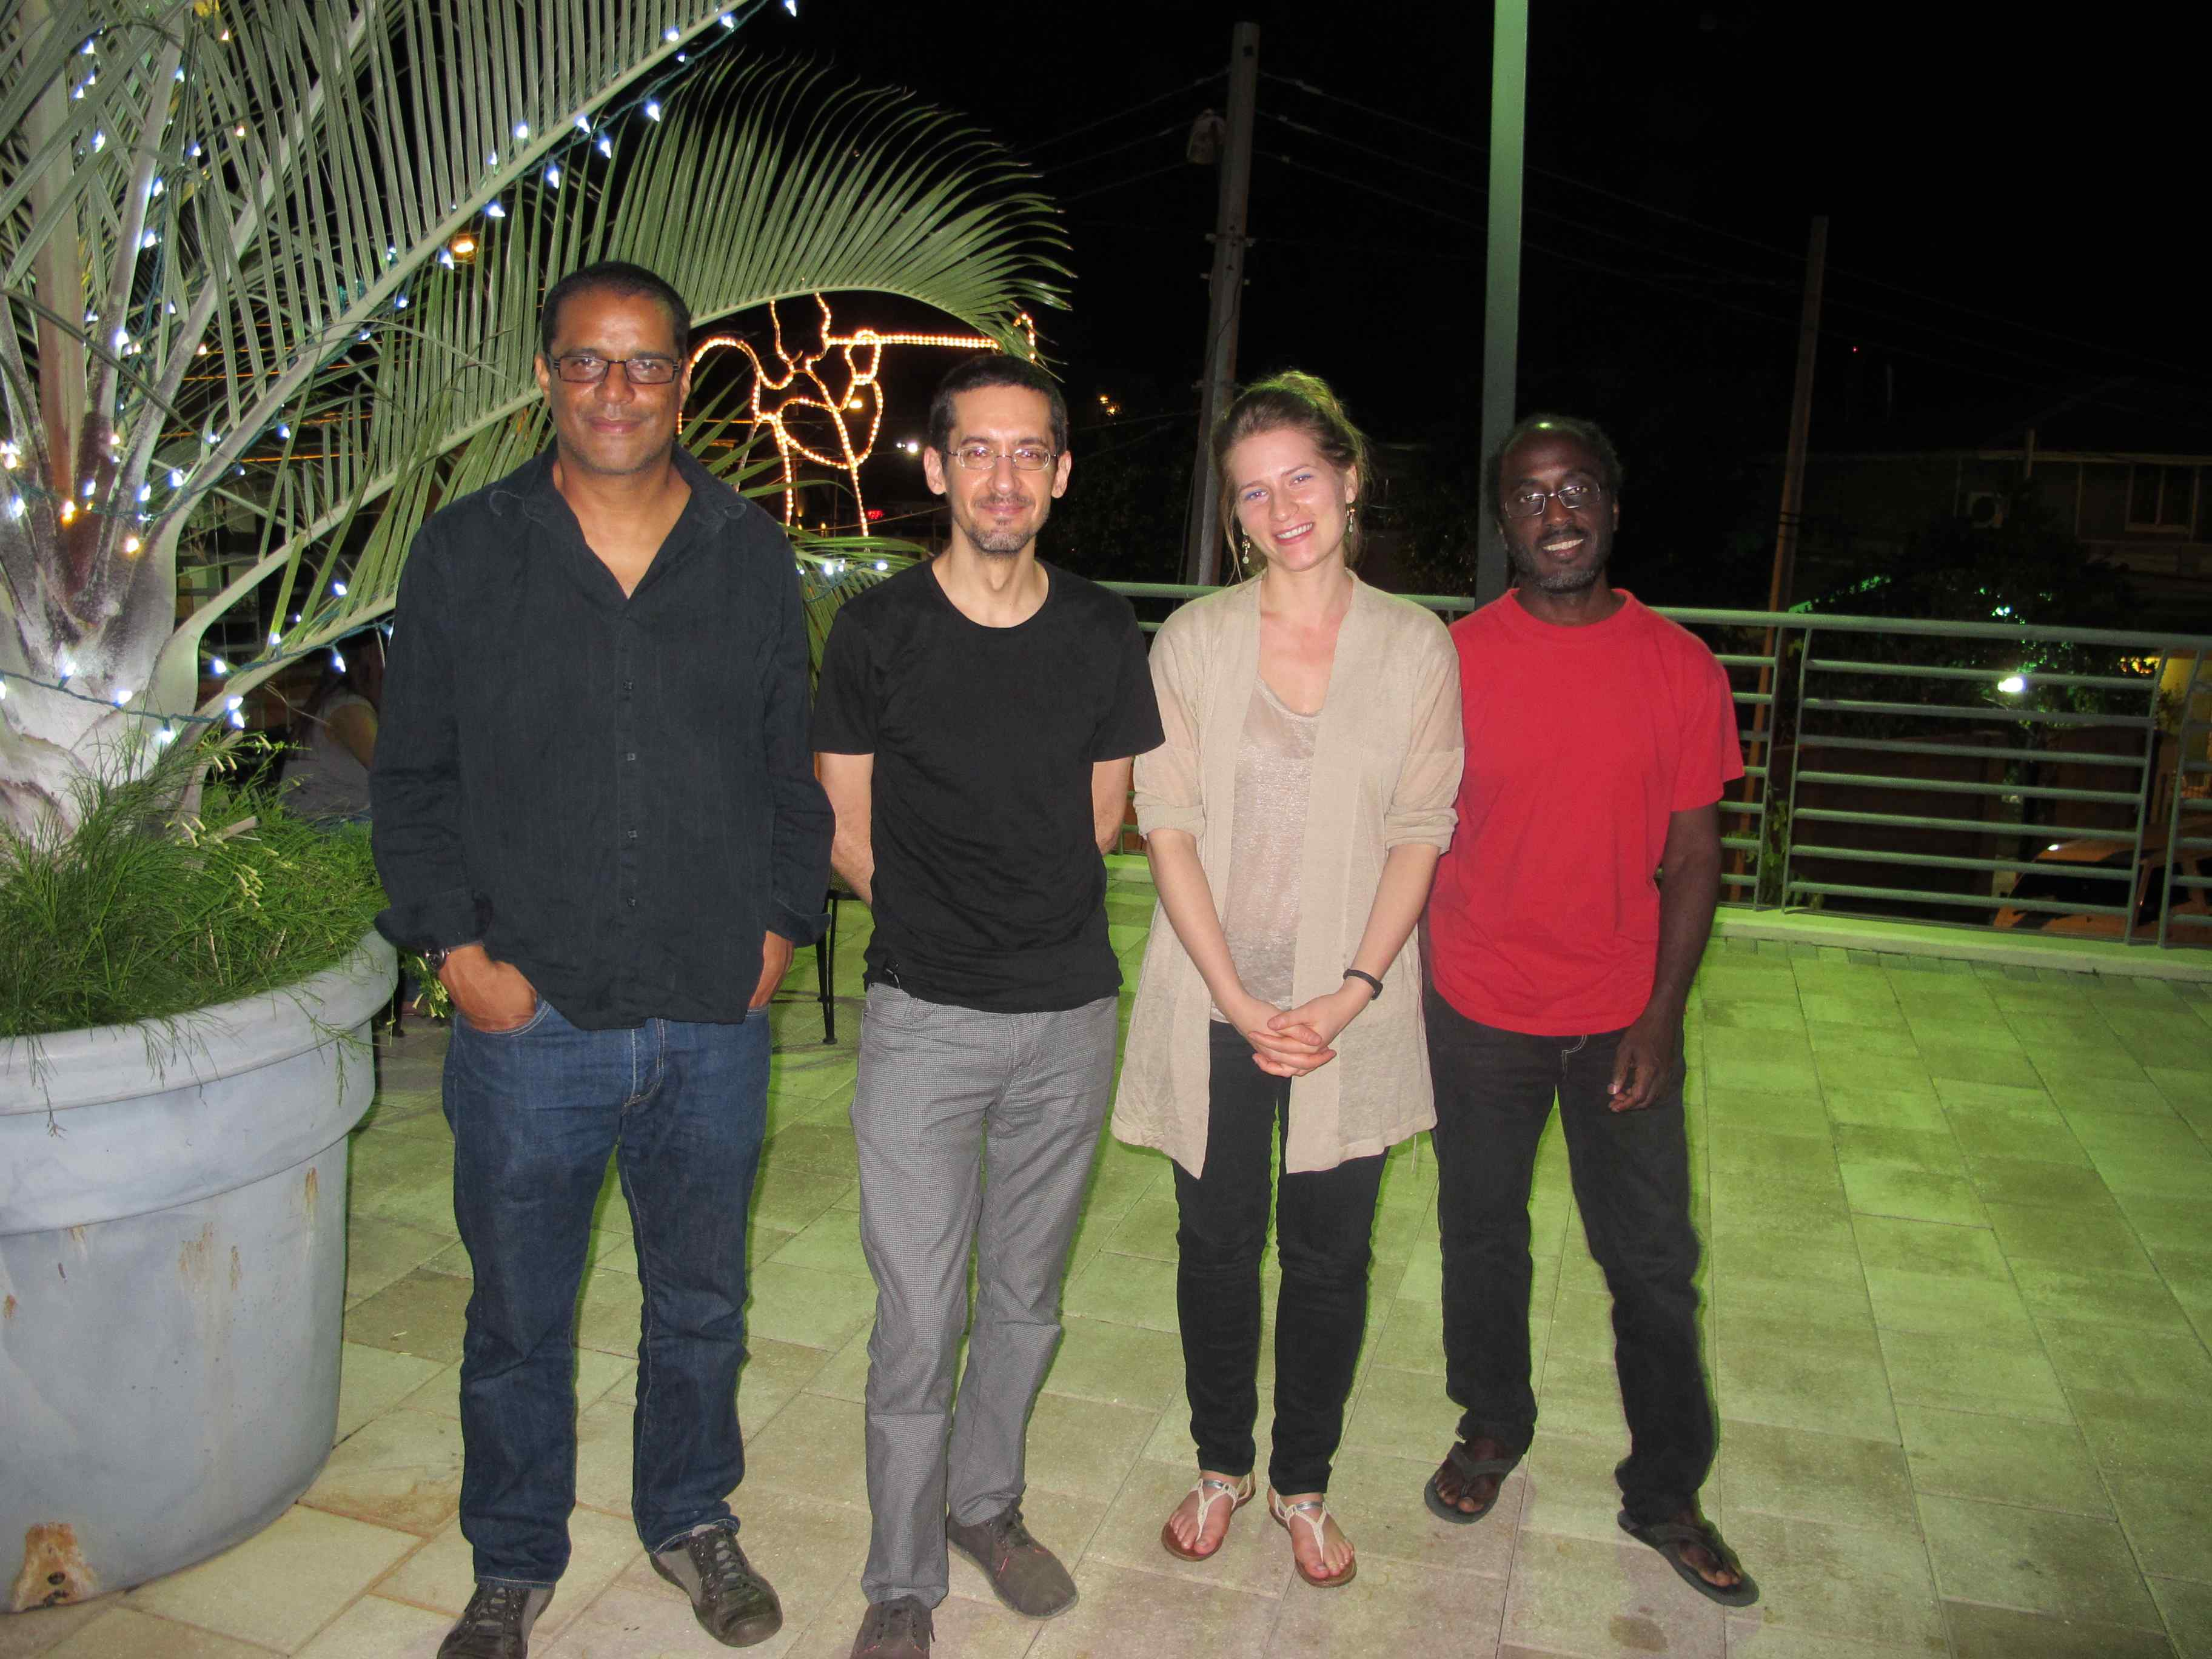 From left: Cozier, Nicholas Laughlin, Hannah Dumes and Sean Leonard